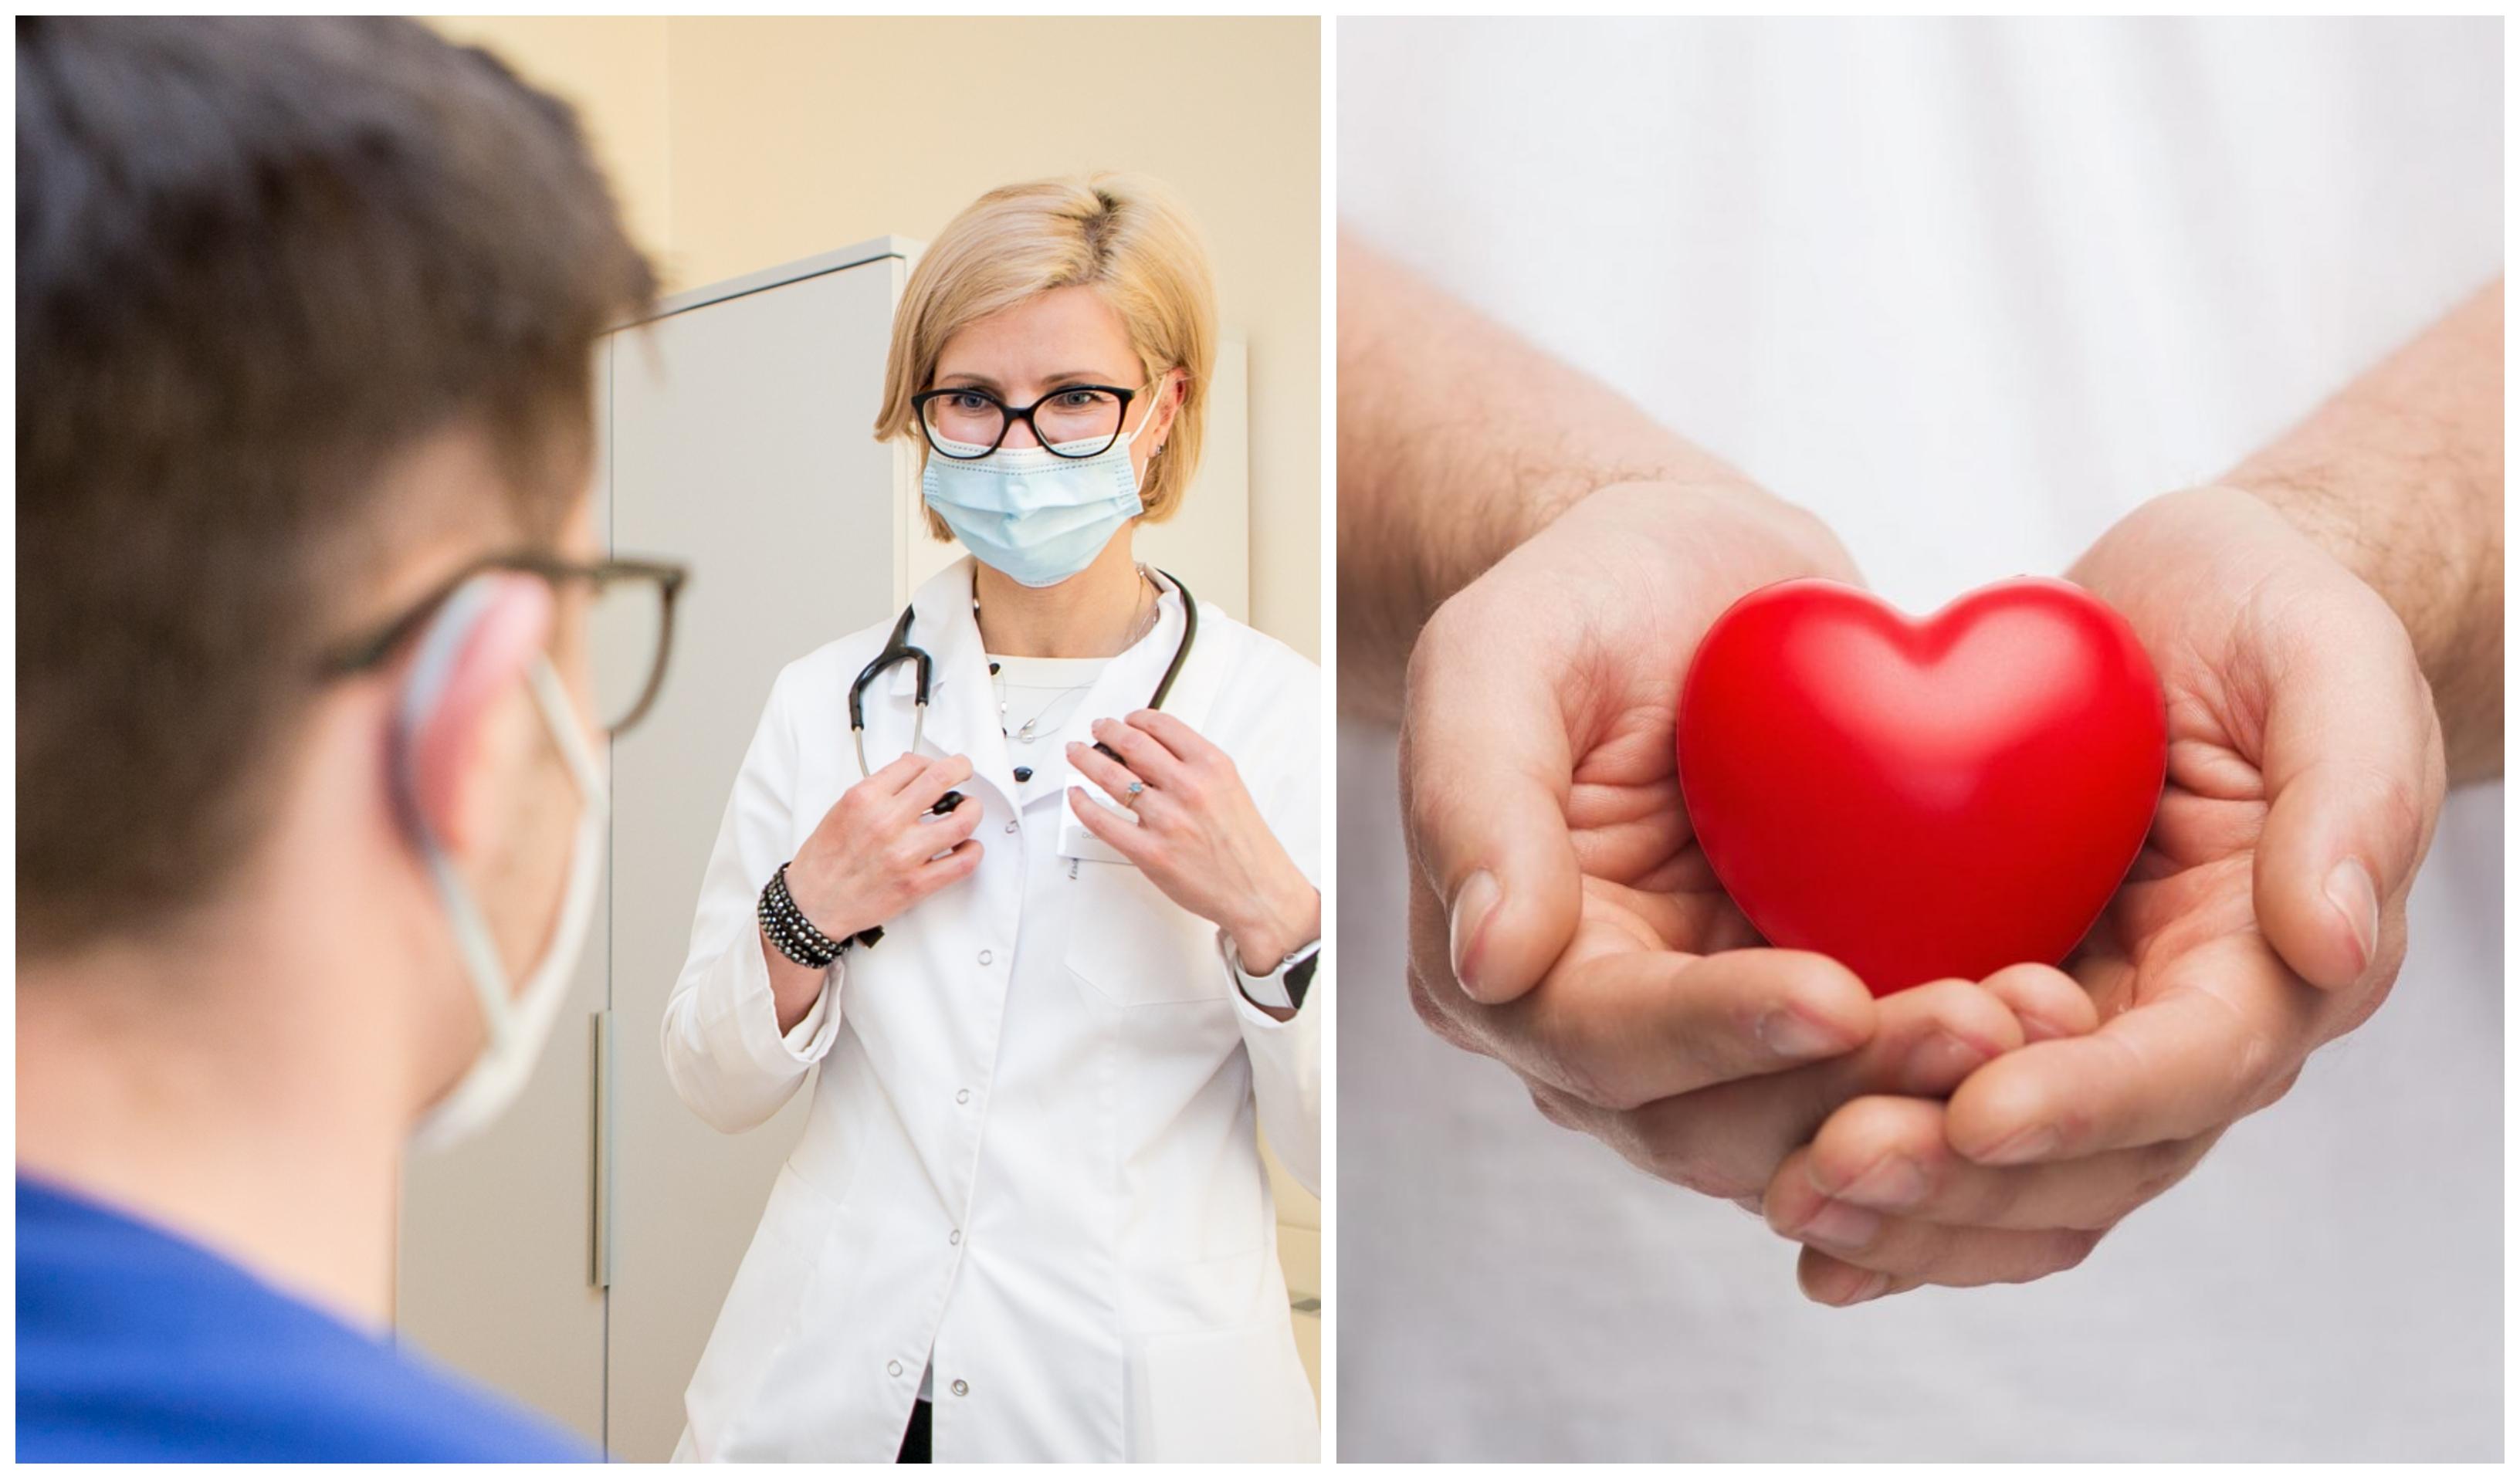 hipertenzija spazgan